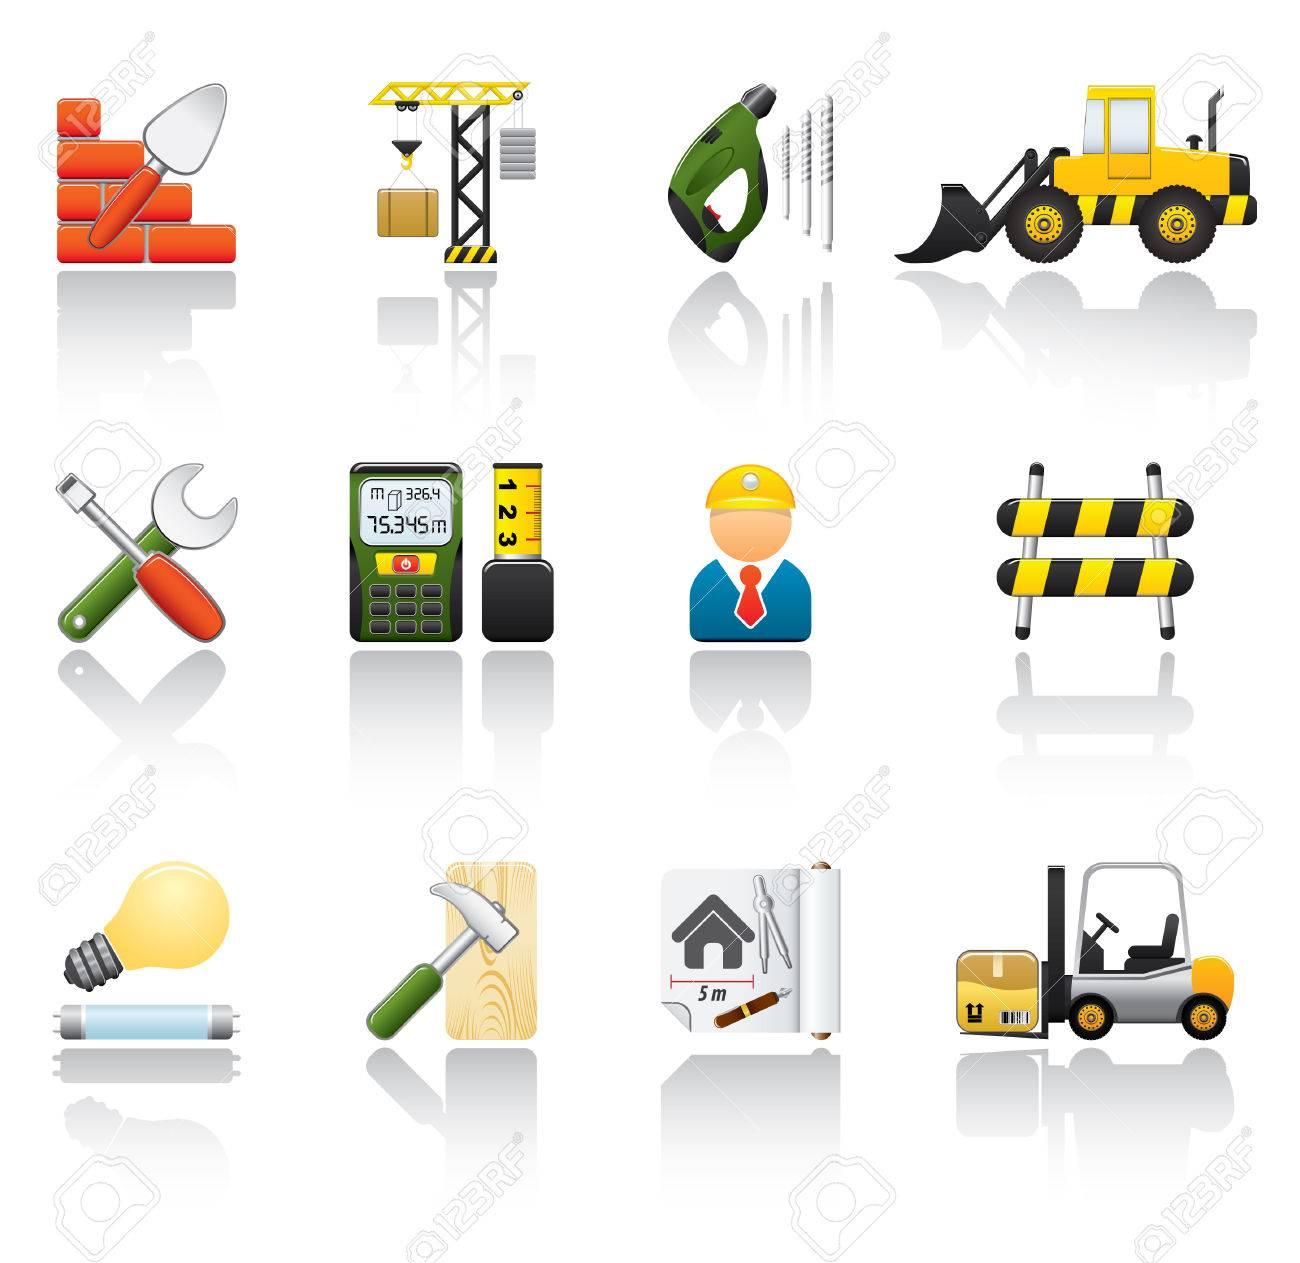 Construction Icon Set. Easy To Edit Vector Image. Stock Vector - 3770272